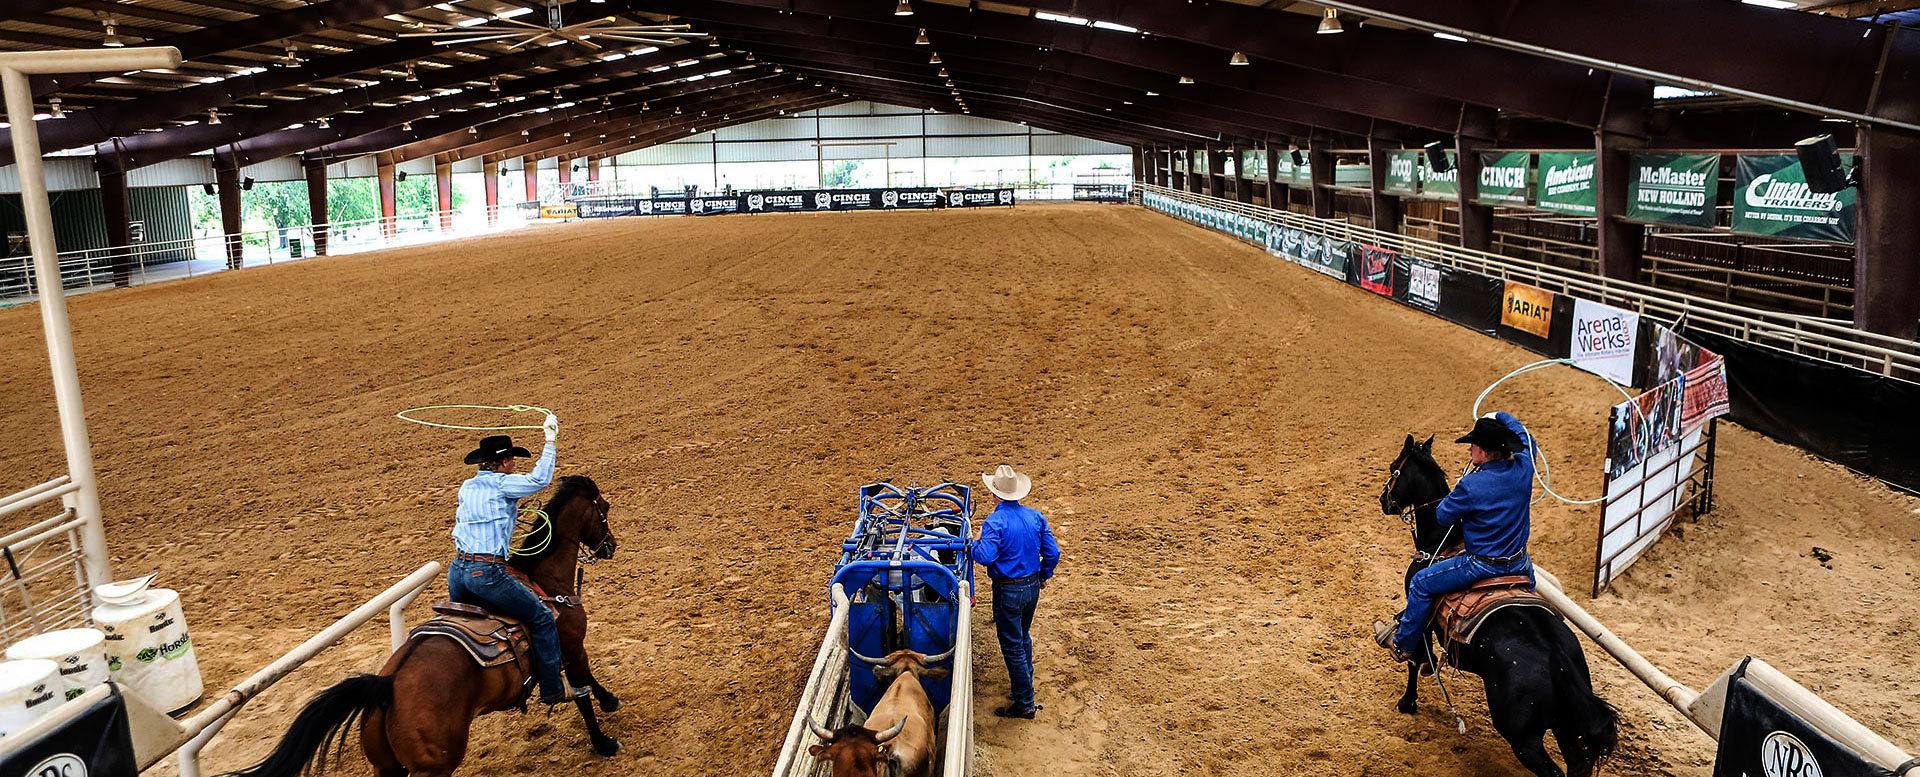 Equine Events, Clinics & More